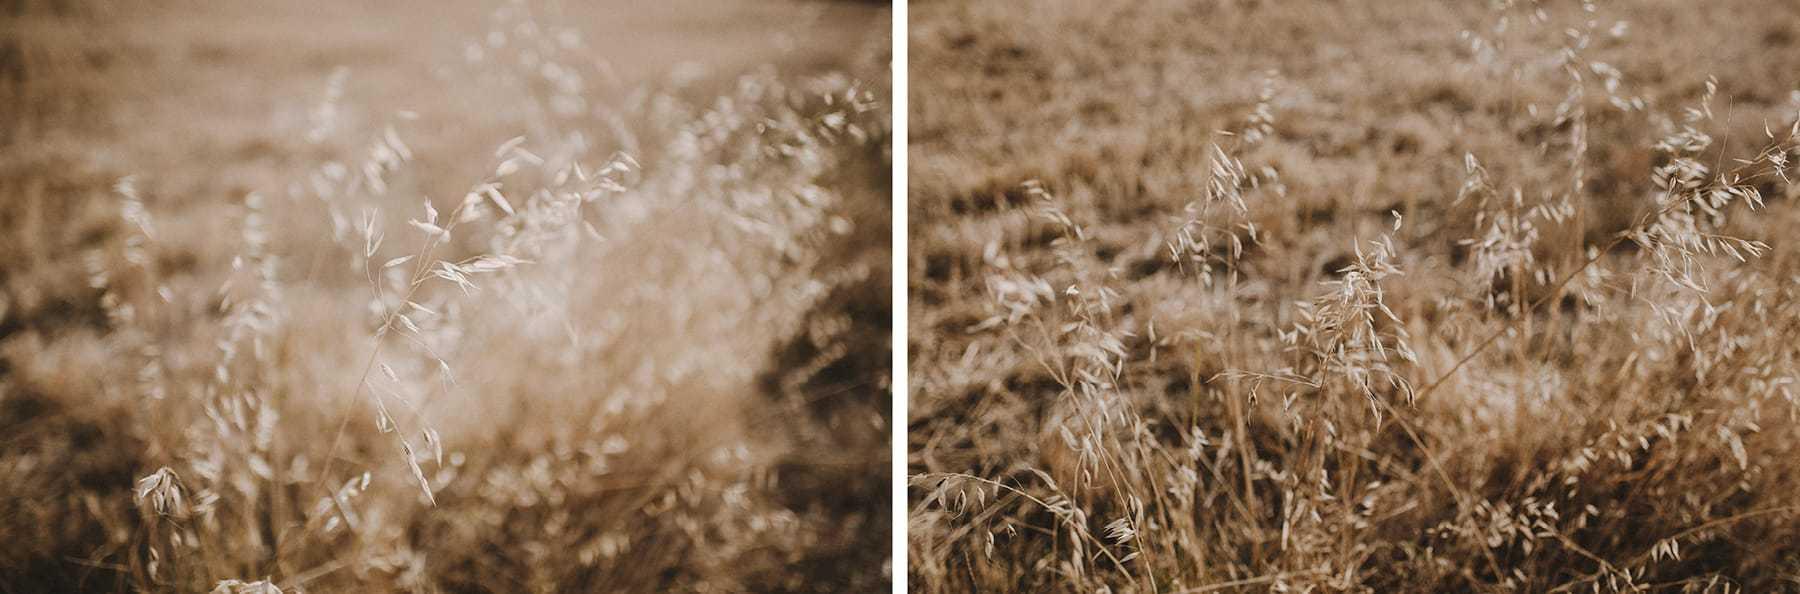 hilario_sanchez_fotografo_boda_moderno_madrid_037